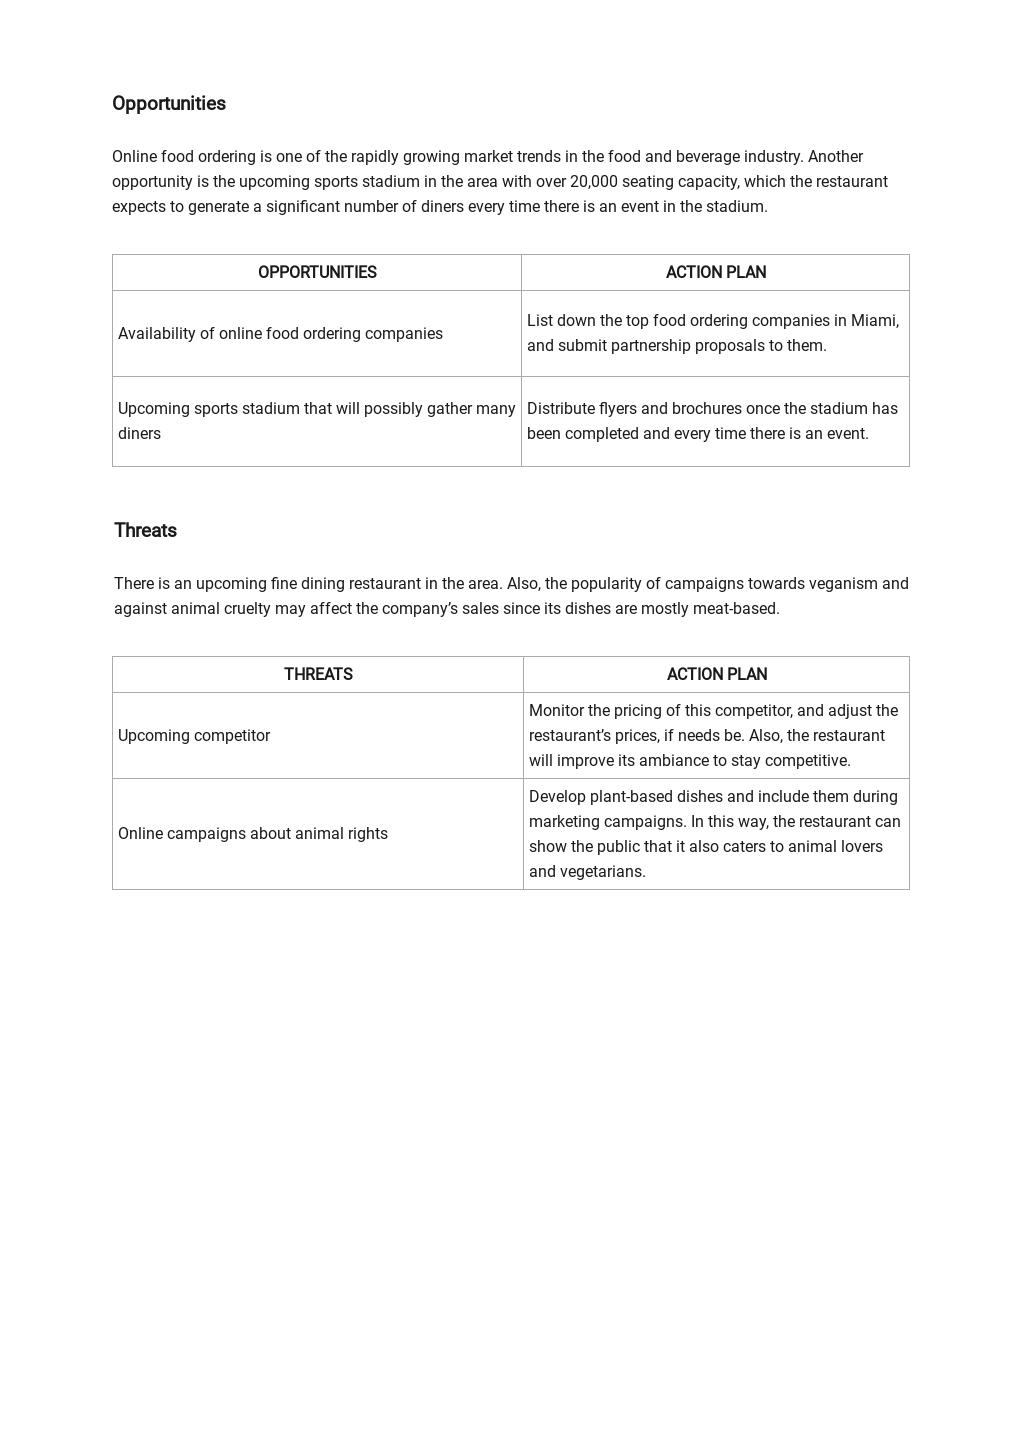 Restaurant SWOT Analysis Template 2.jpe